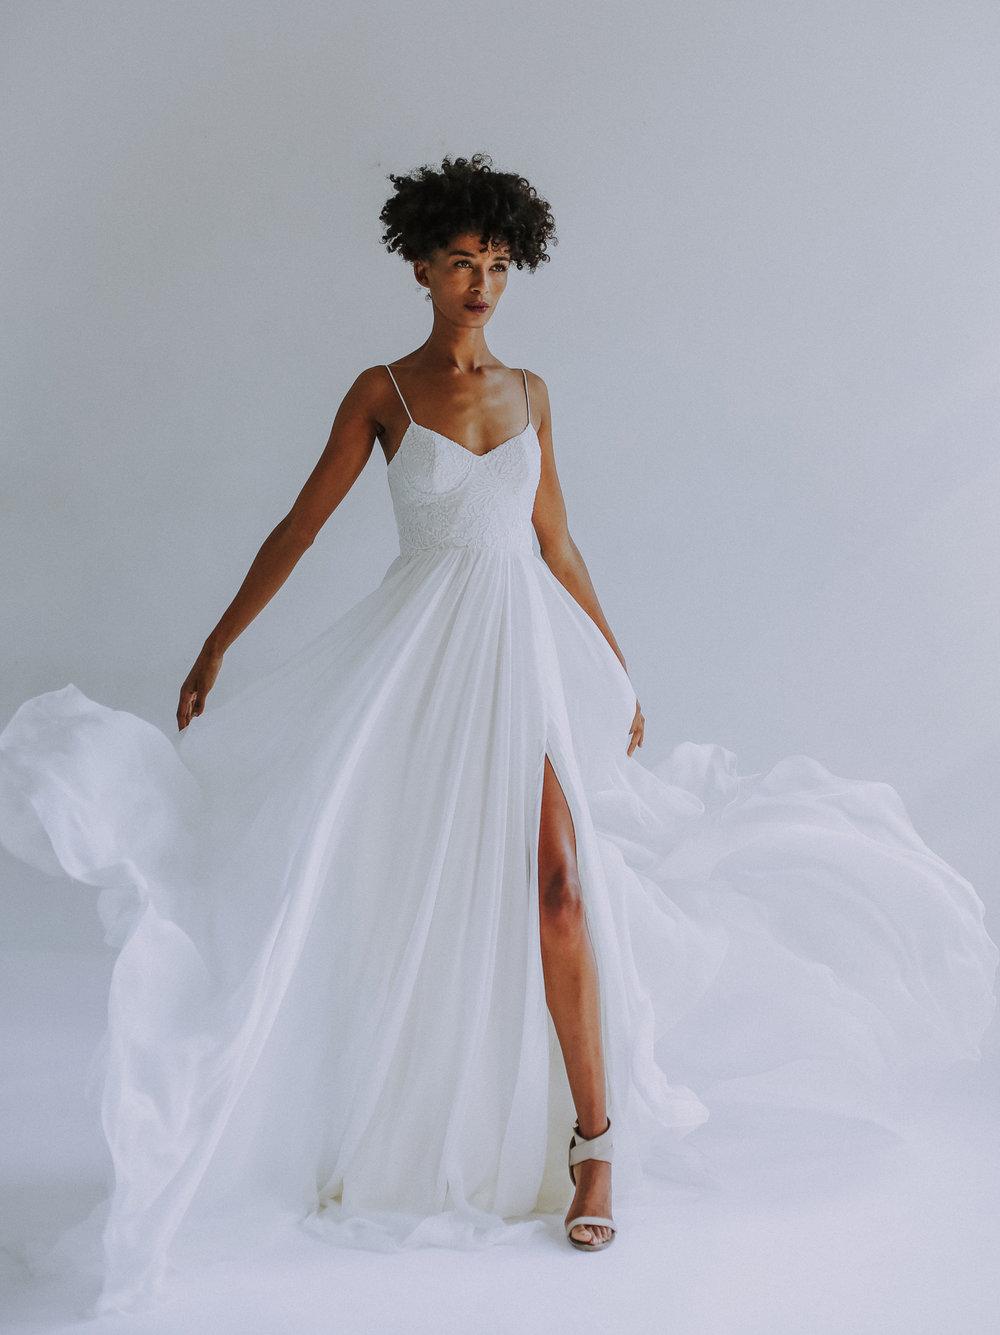 leanne-marshall-wedding-gown-1.jpg